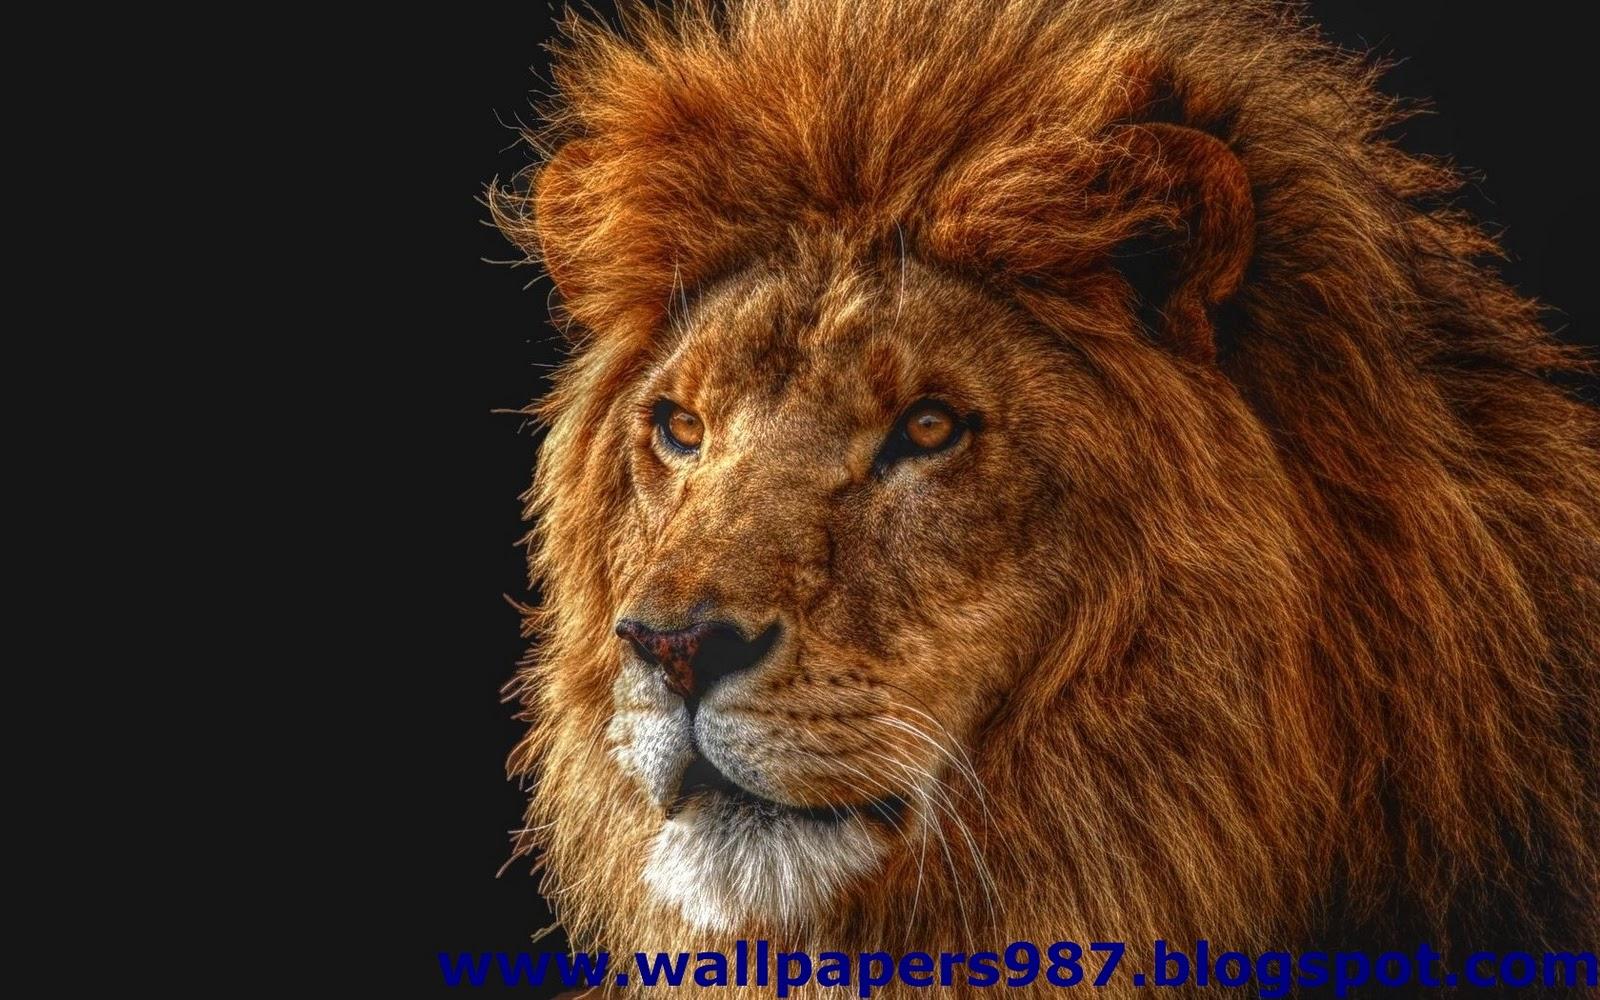 http://1.bp.blogspot.com/_SOSNZoTv8ng/TQYWvyyS3KI/AAAAAAAAAHY/7255onB8sFA/s1600/windows_masaustu_arka_plan_resimleri_vahsi_kediler_aslan_kaplan_HD_HQ_Full_Animal.+Pic+%2528142%2529.jpg